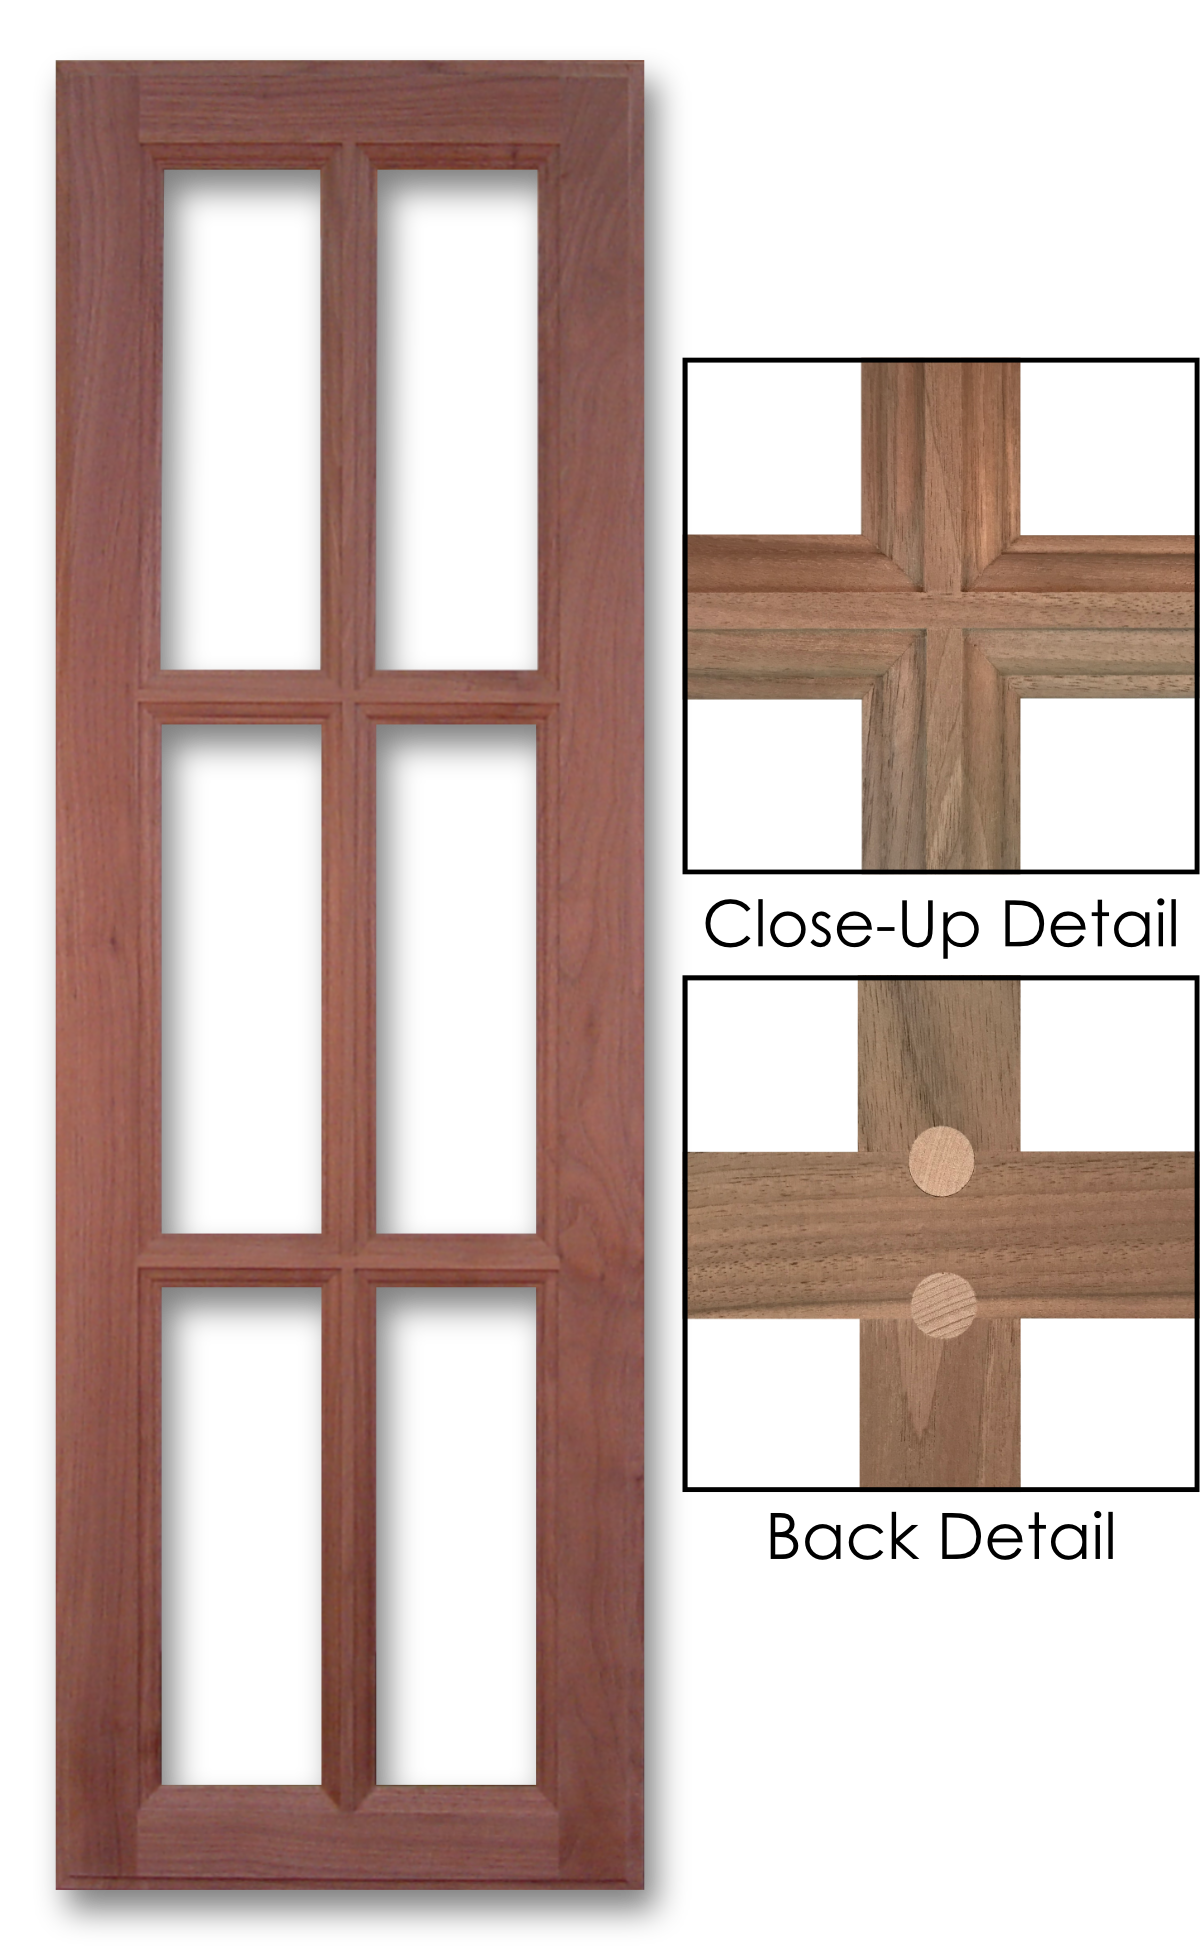 700 Black Walnut Mullion Grid + Close-Up Details Front u0026 Back  sc 1 st  Scherru0027s Cabinet u0026 Doors Inc. & Open Frame Doors u0026 Mullion Grids pezcame.com